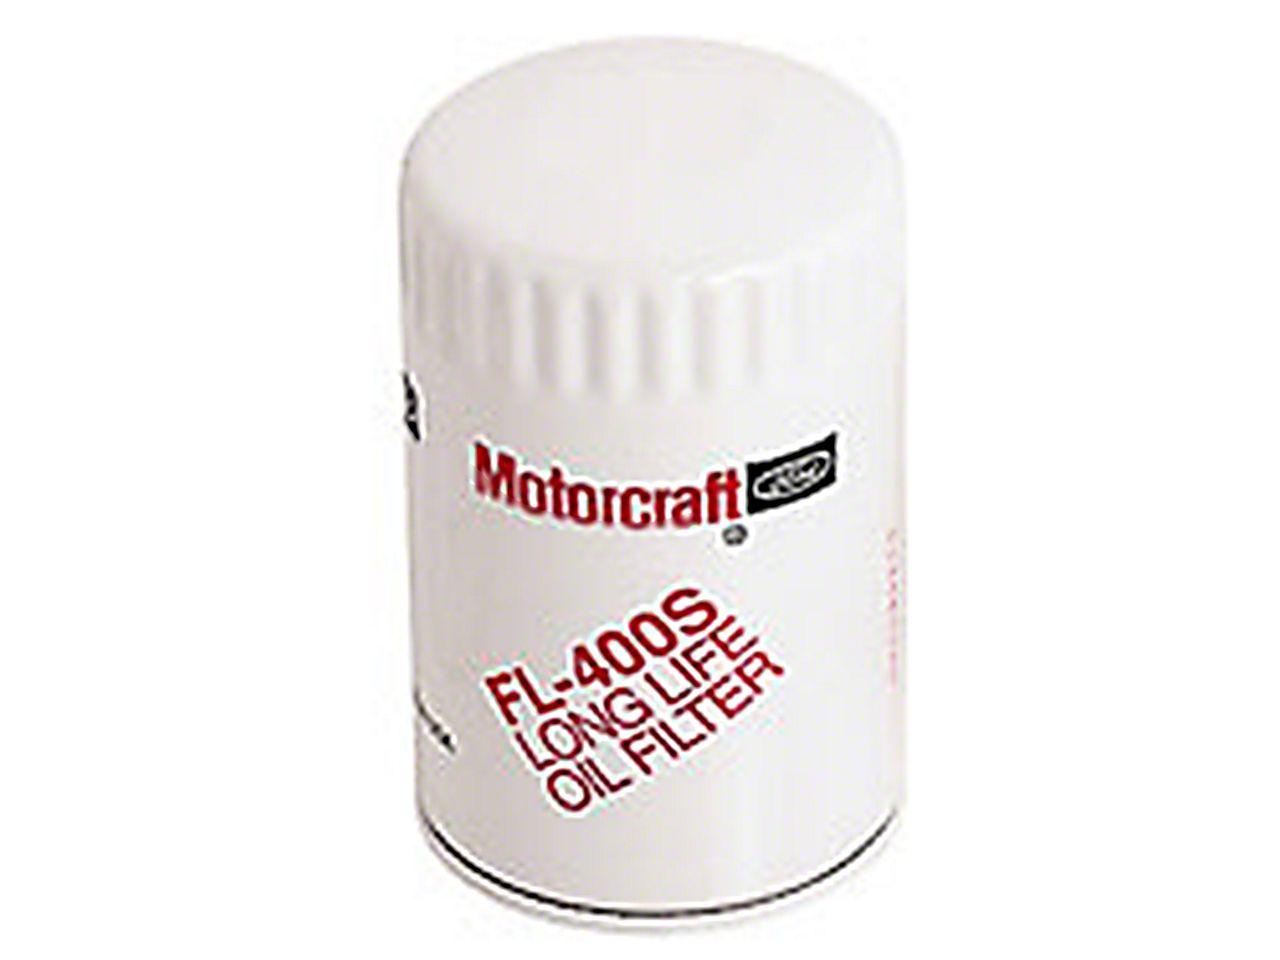 Ford Motorcraft OEM Oil Filter (94-04 V6)